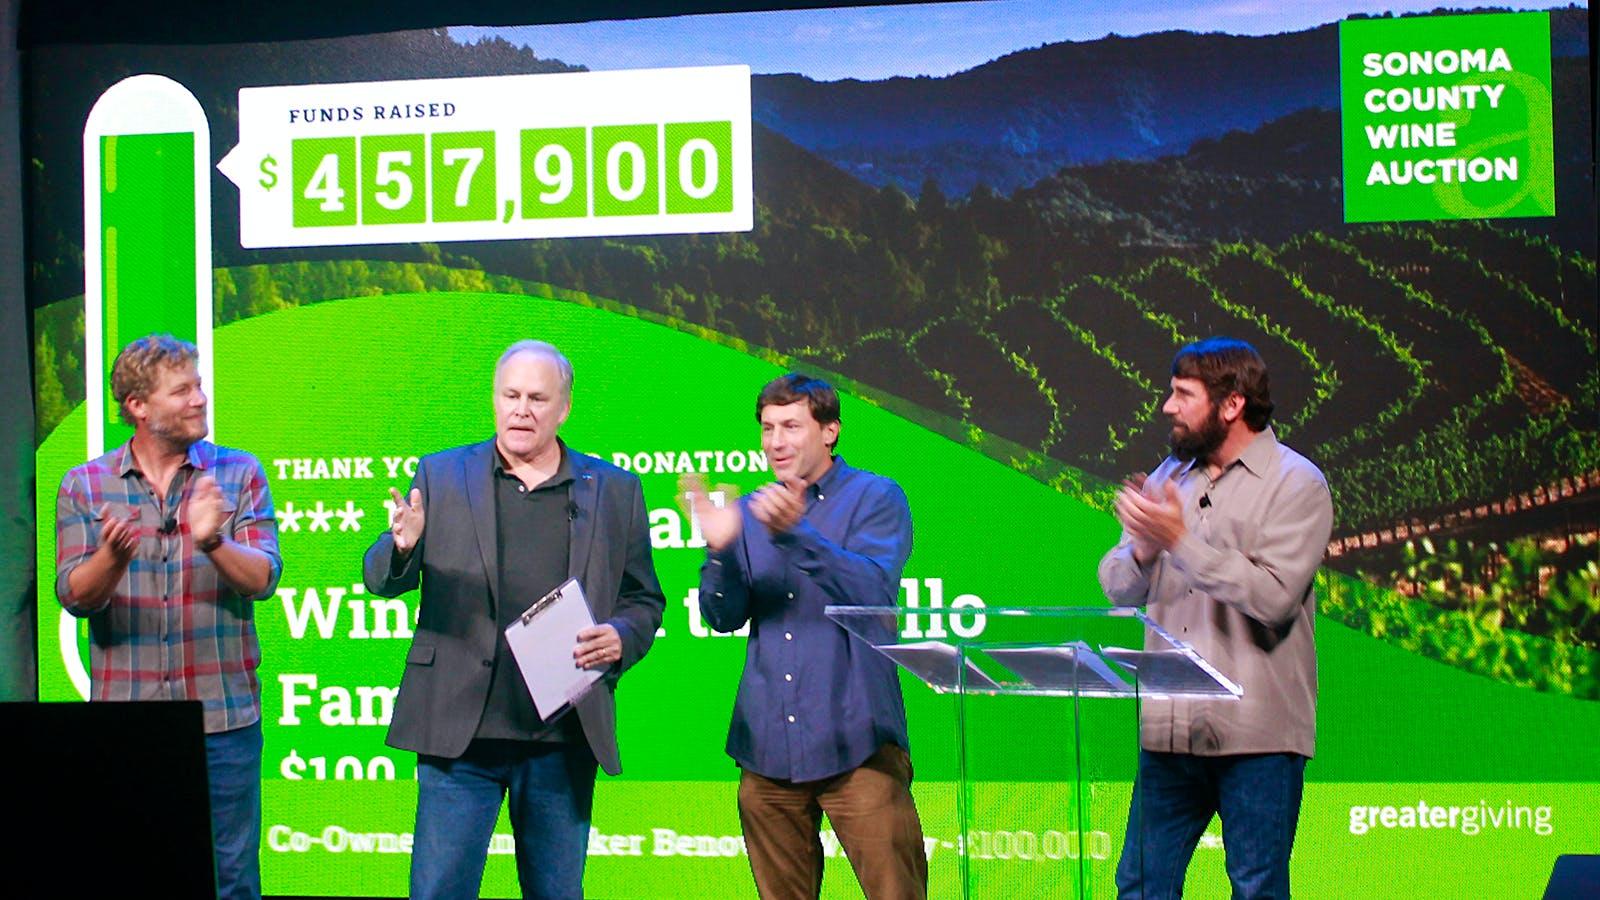 Sonoma County Wine Auction Raises $1.17 Million with Online Bidding